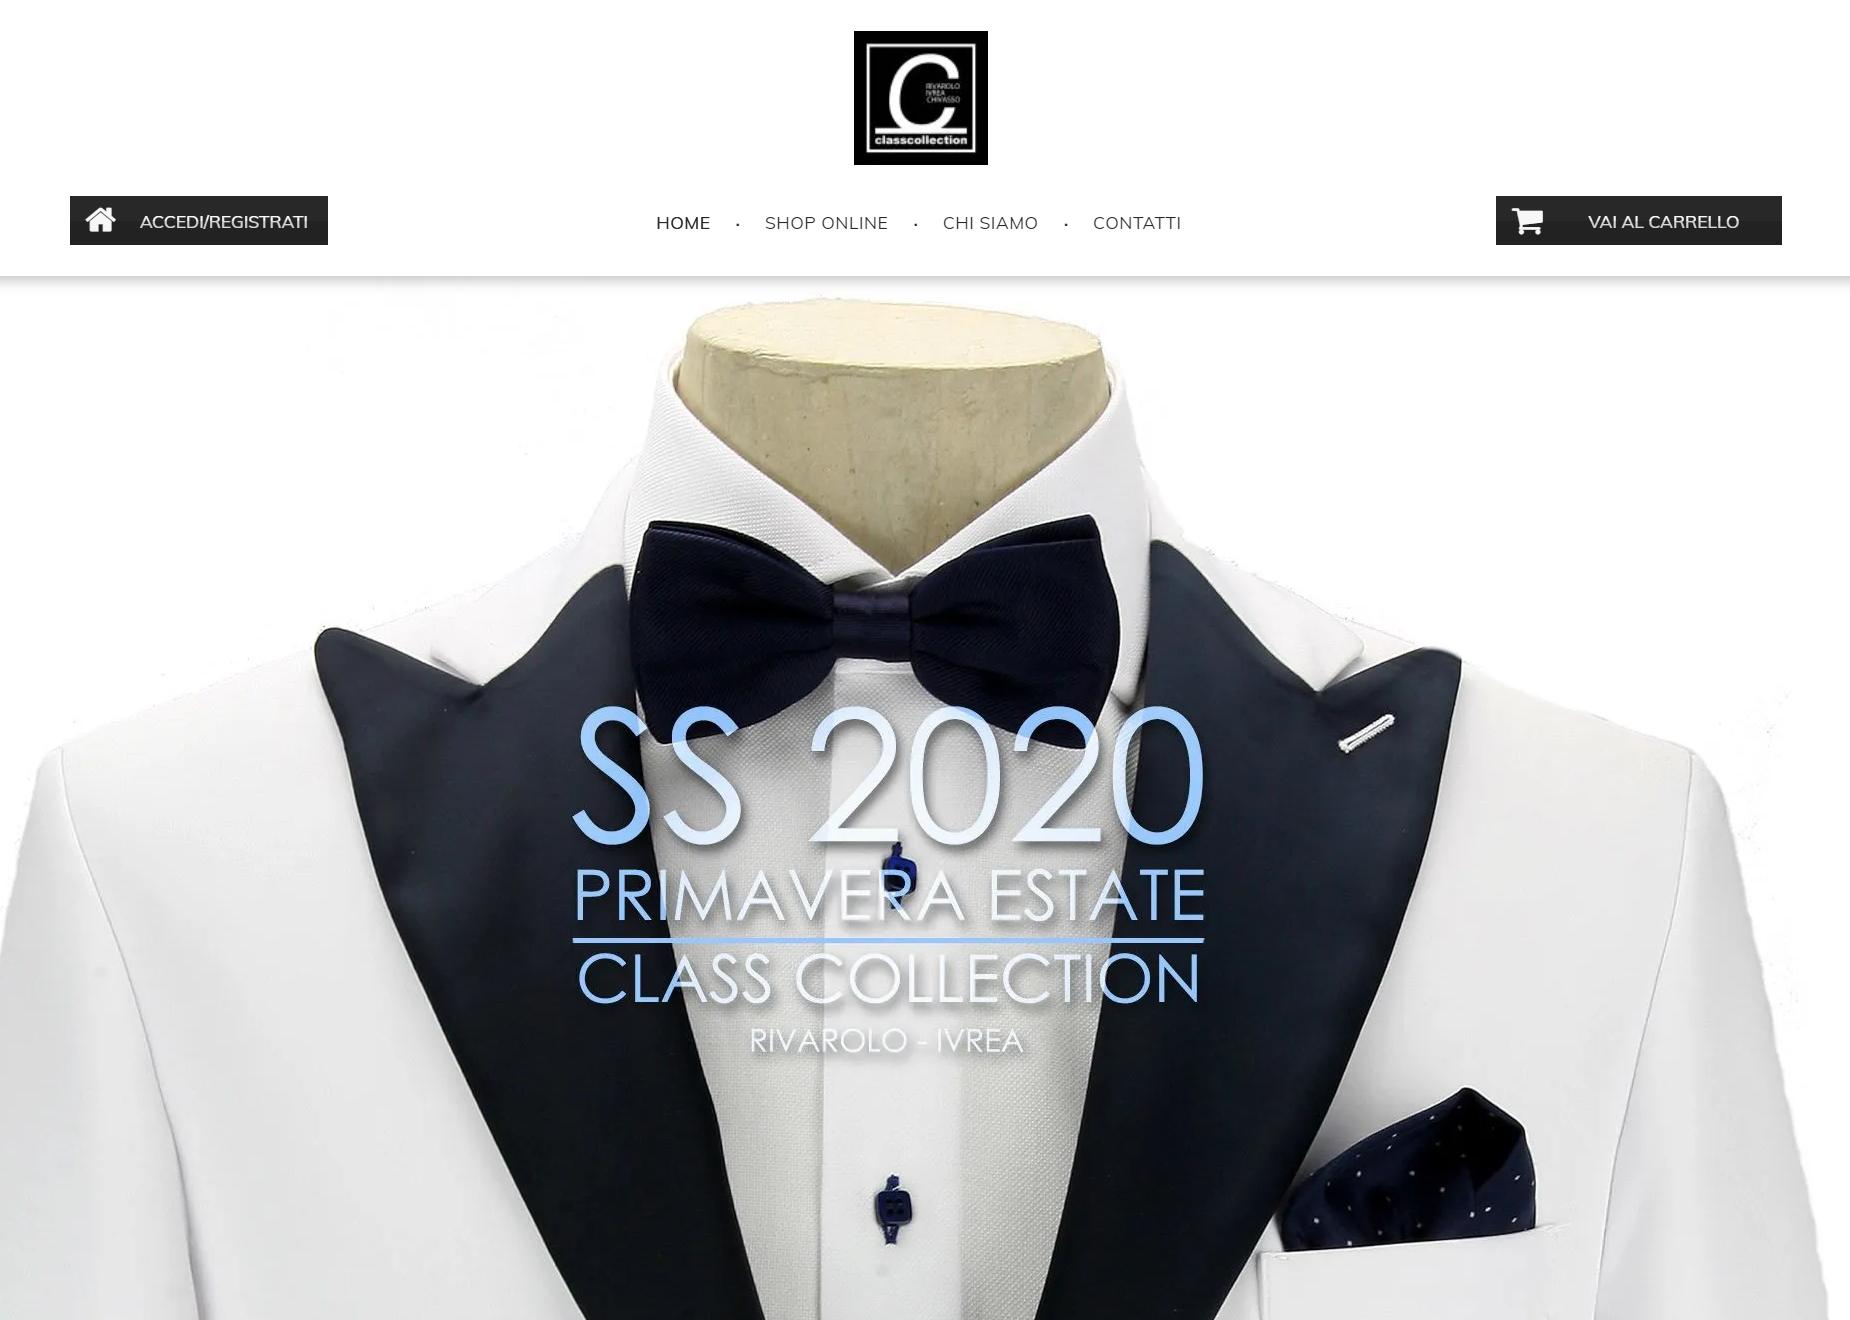 screencapture-classrivarolo-it-2020-06-01-12_08_20 (1)